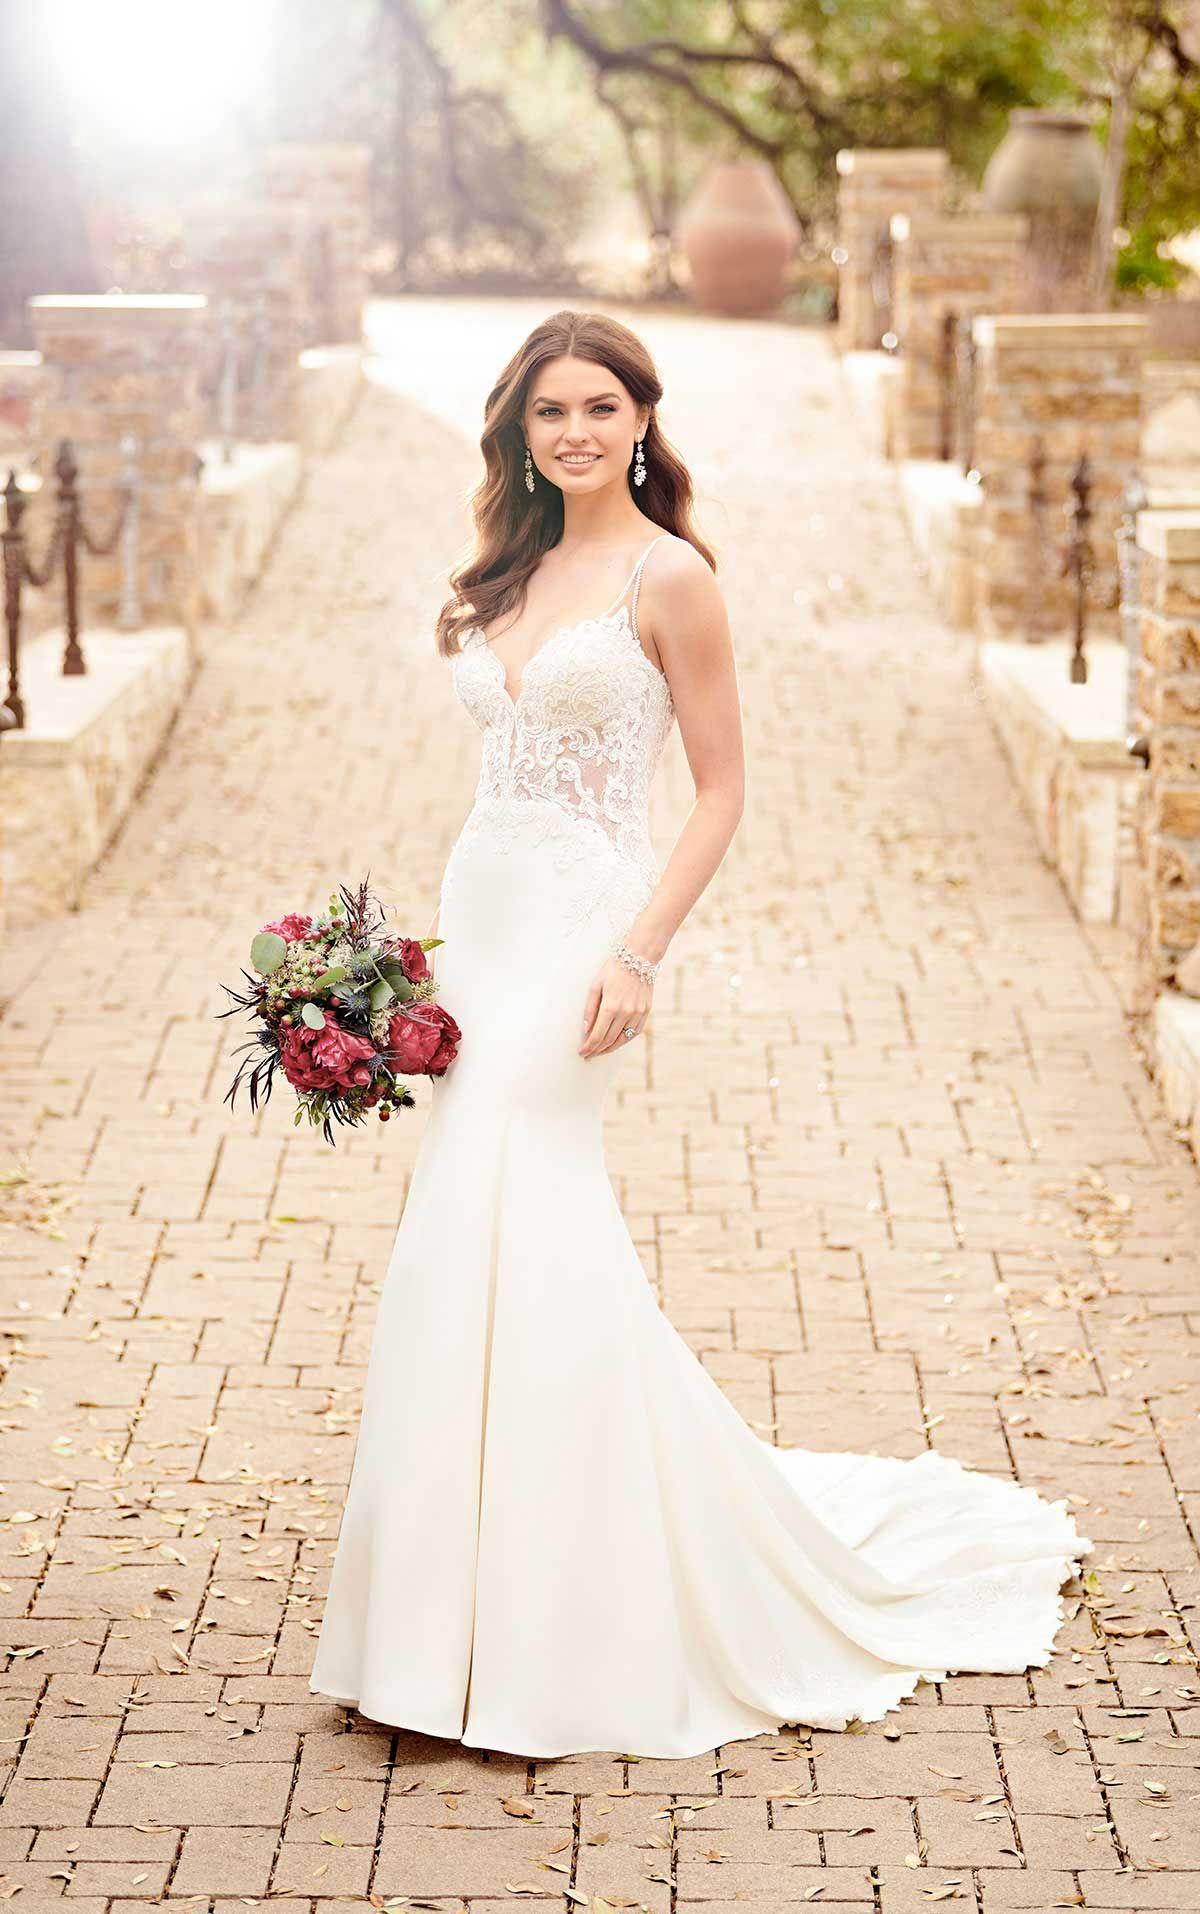 Beaded Sheer Wedding Dress in 2018 | My future wedding | Pinterest ...